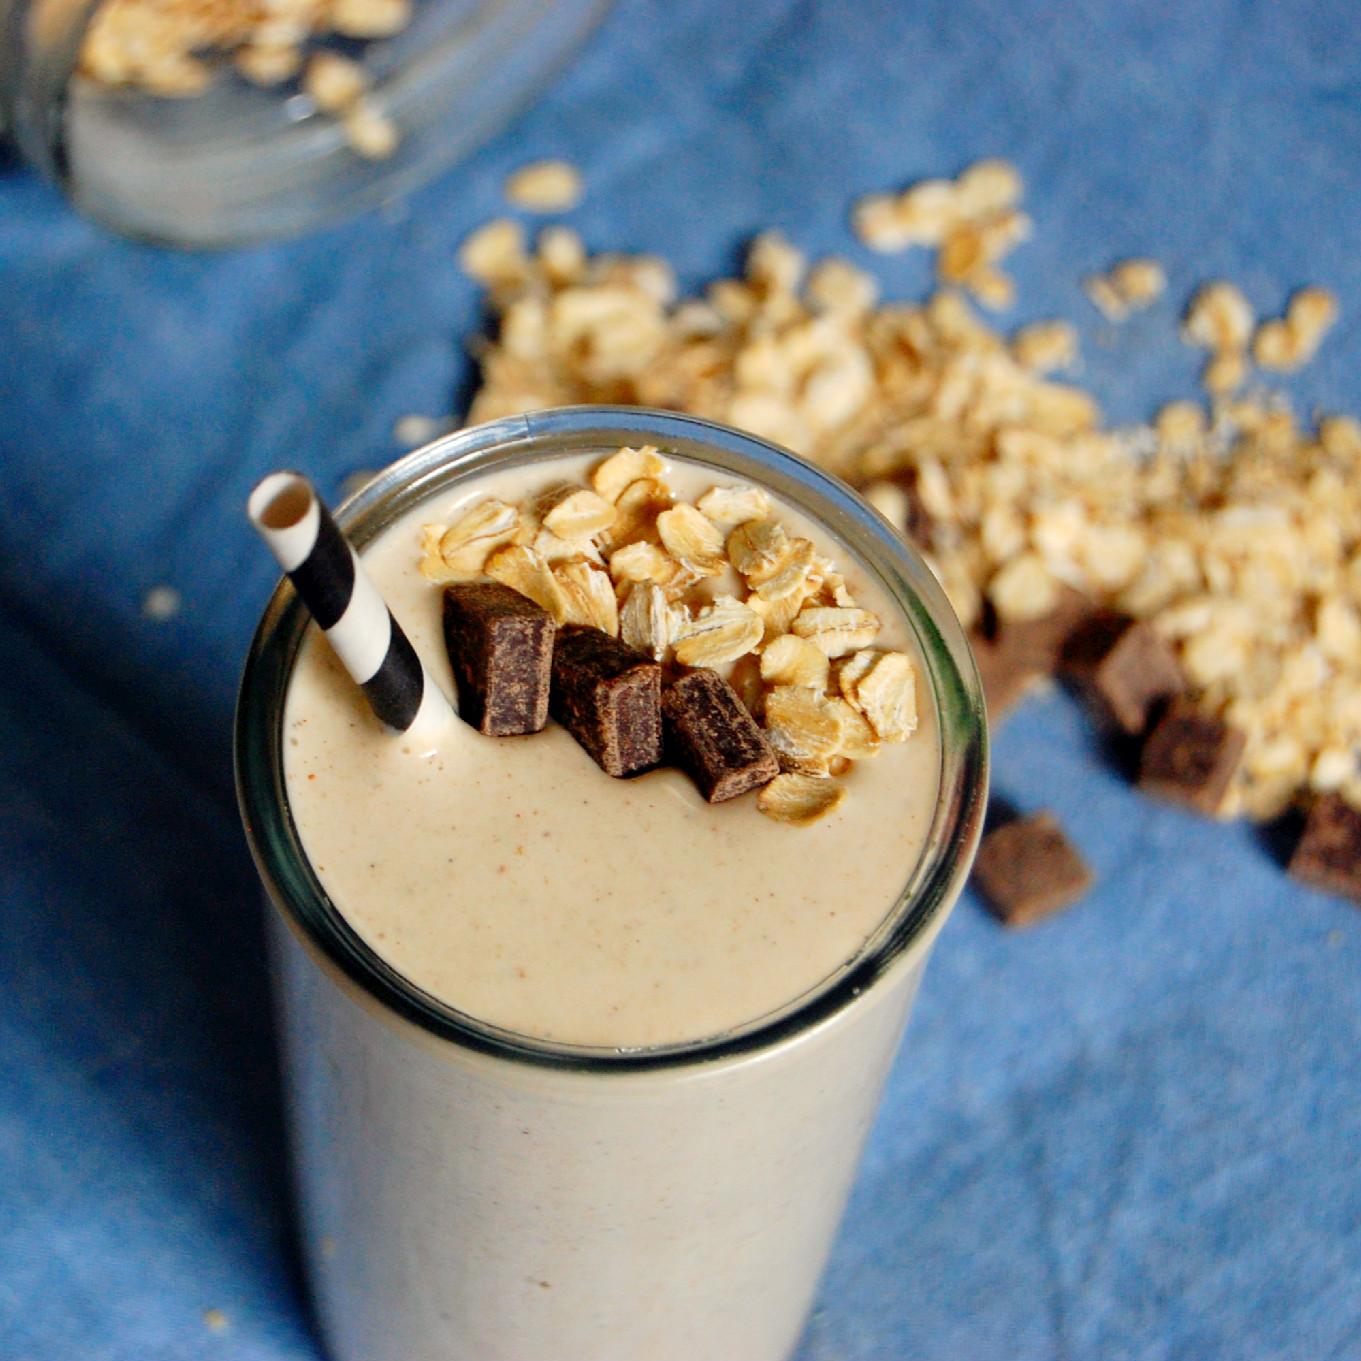 Oatmeal Breakfast Smoothie- tastes like an oatmeal cookie